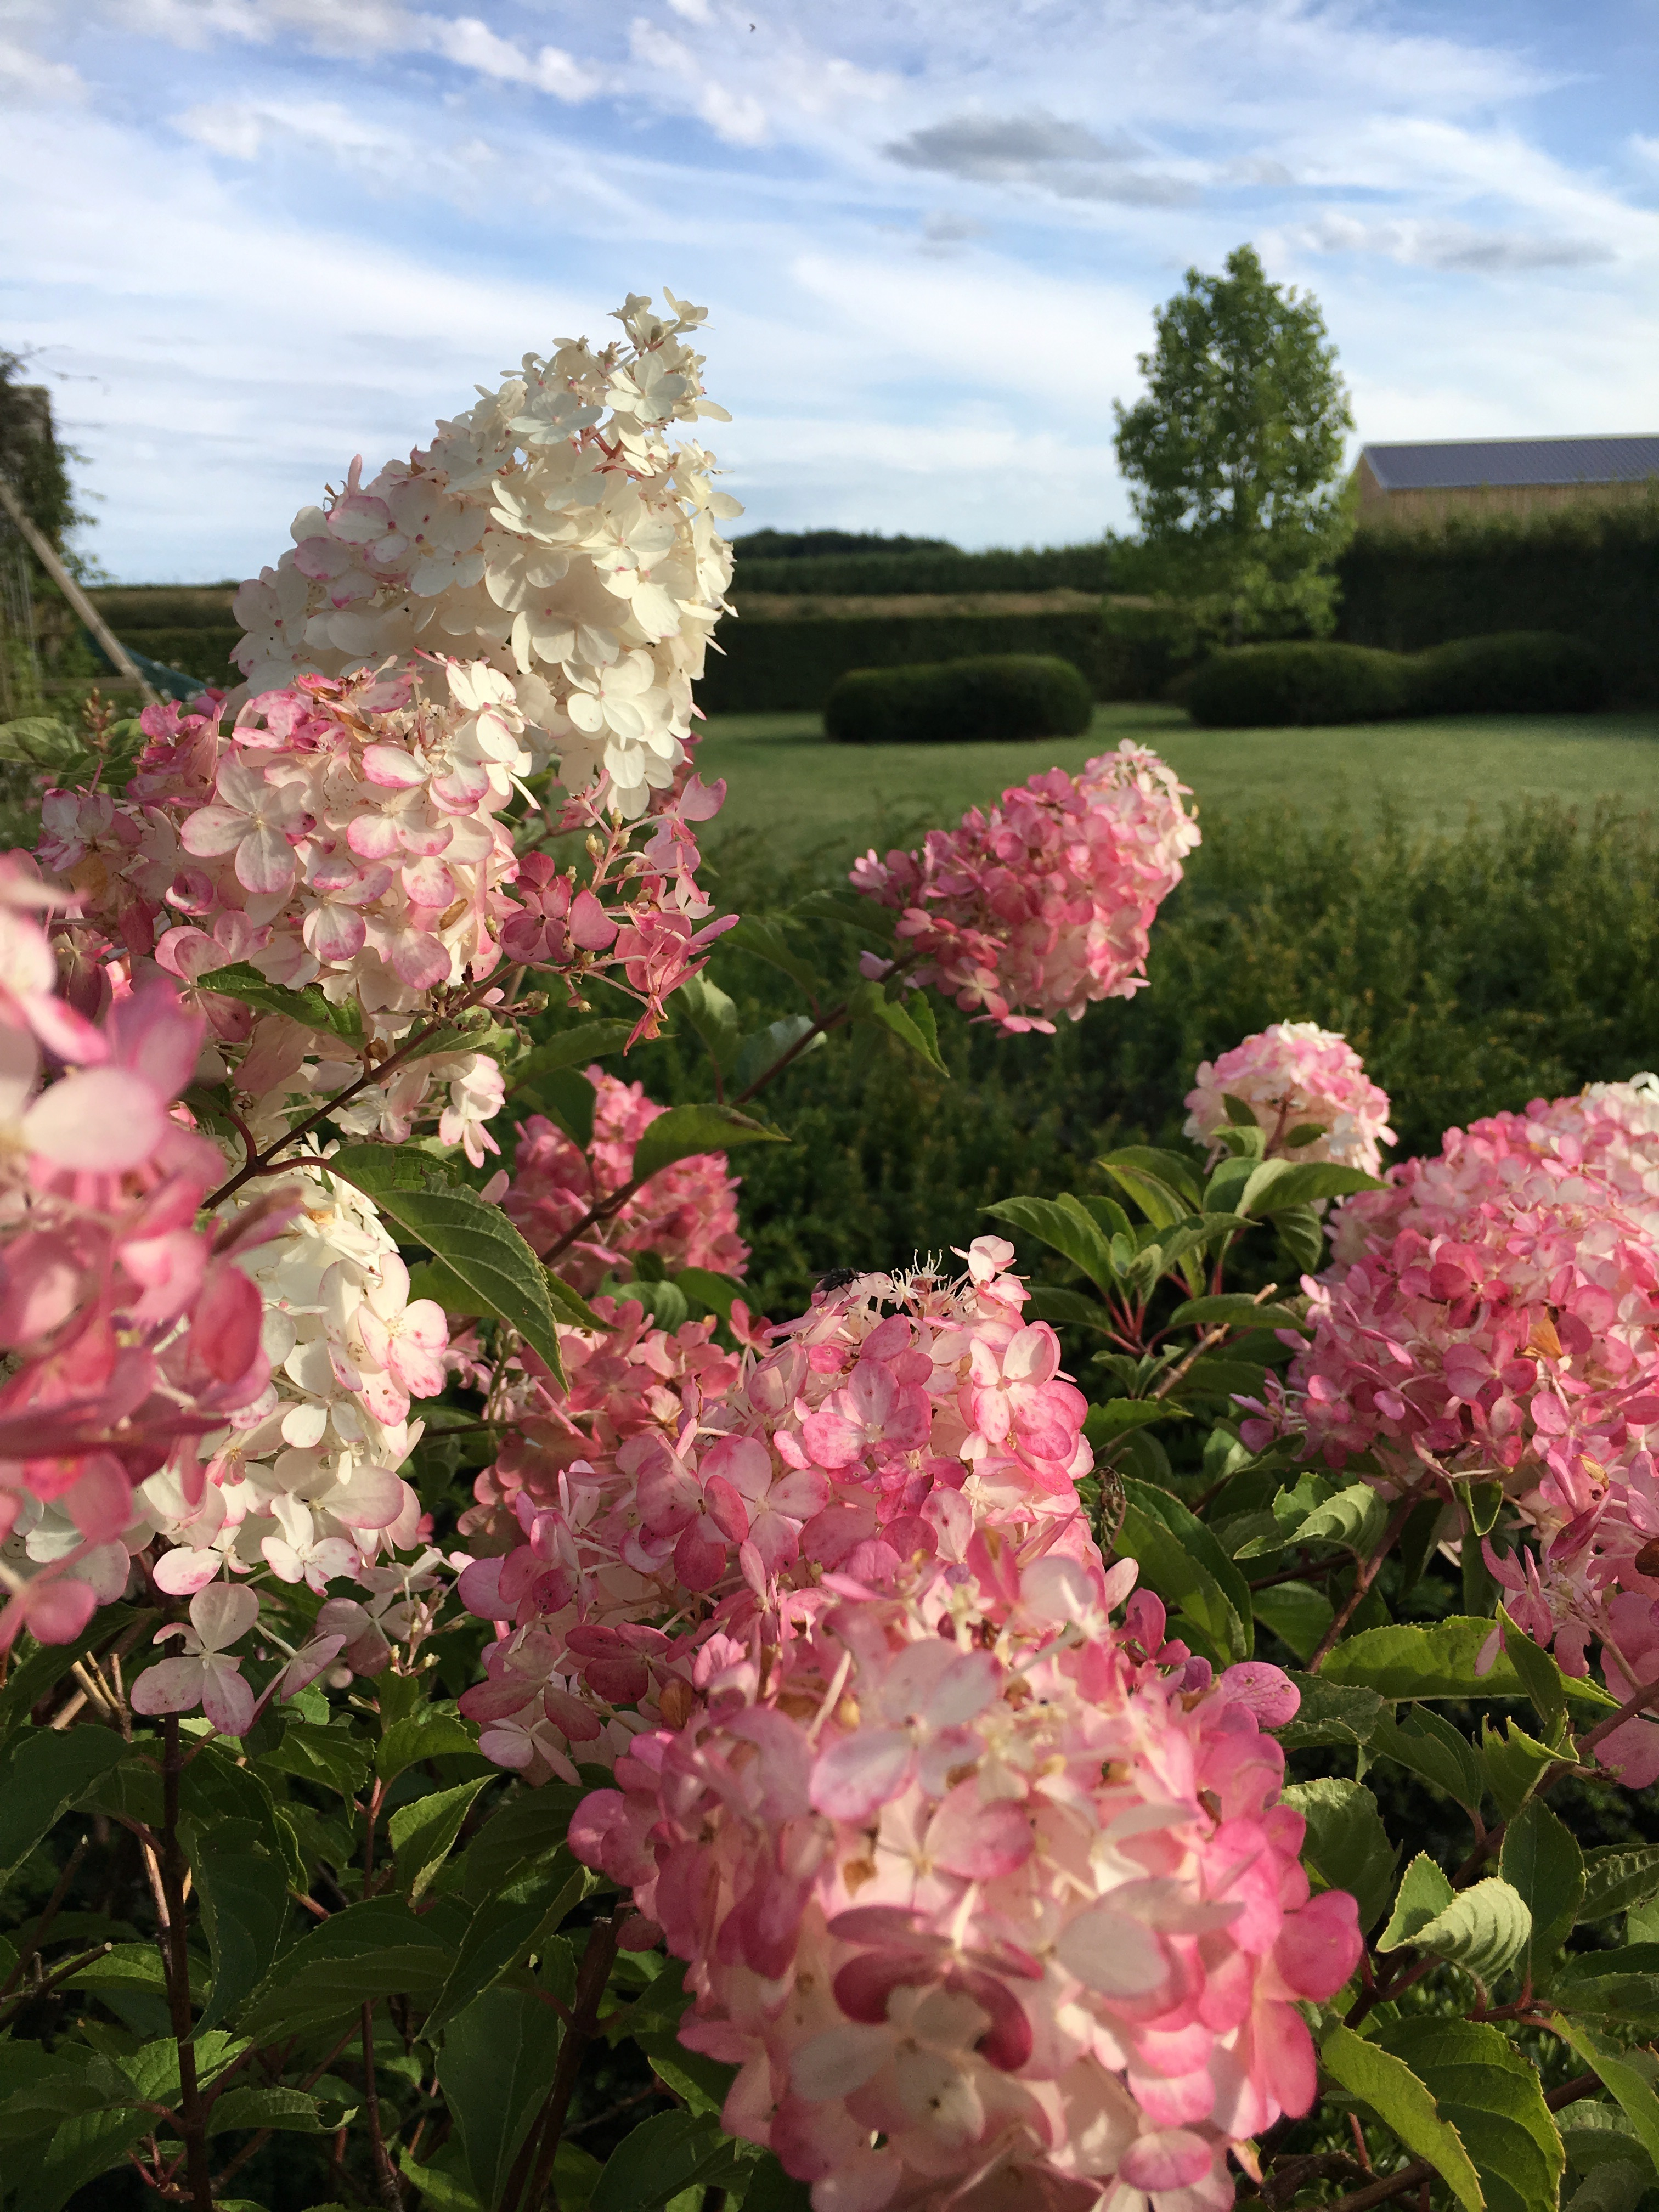 Hydran paniculata vanille fraise